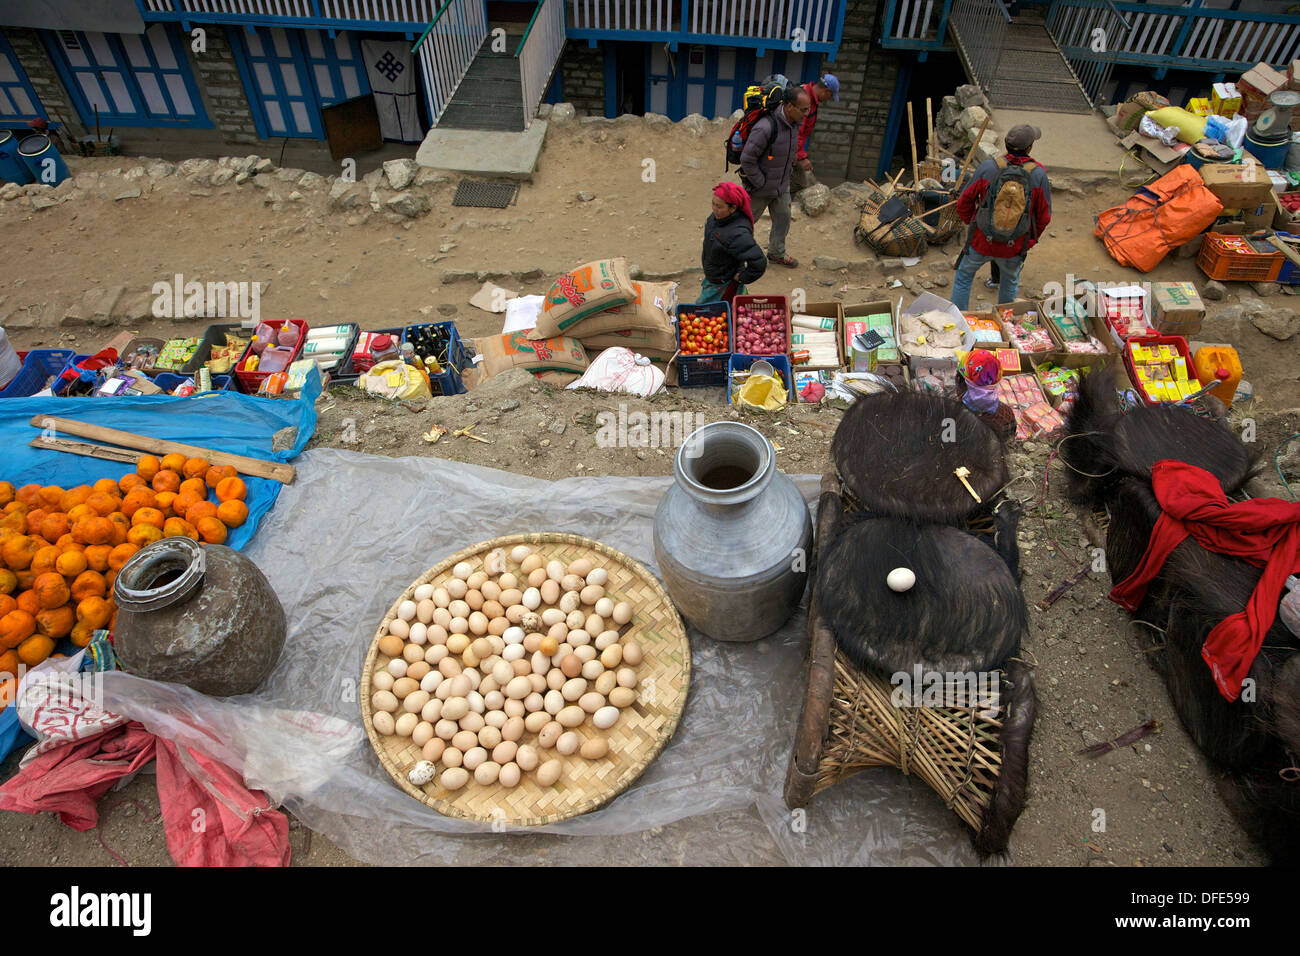 Market stalls in Namche Bazaar, Nepal, Asia - Stock Image